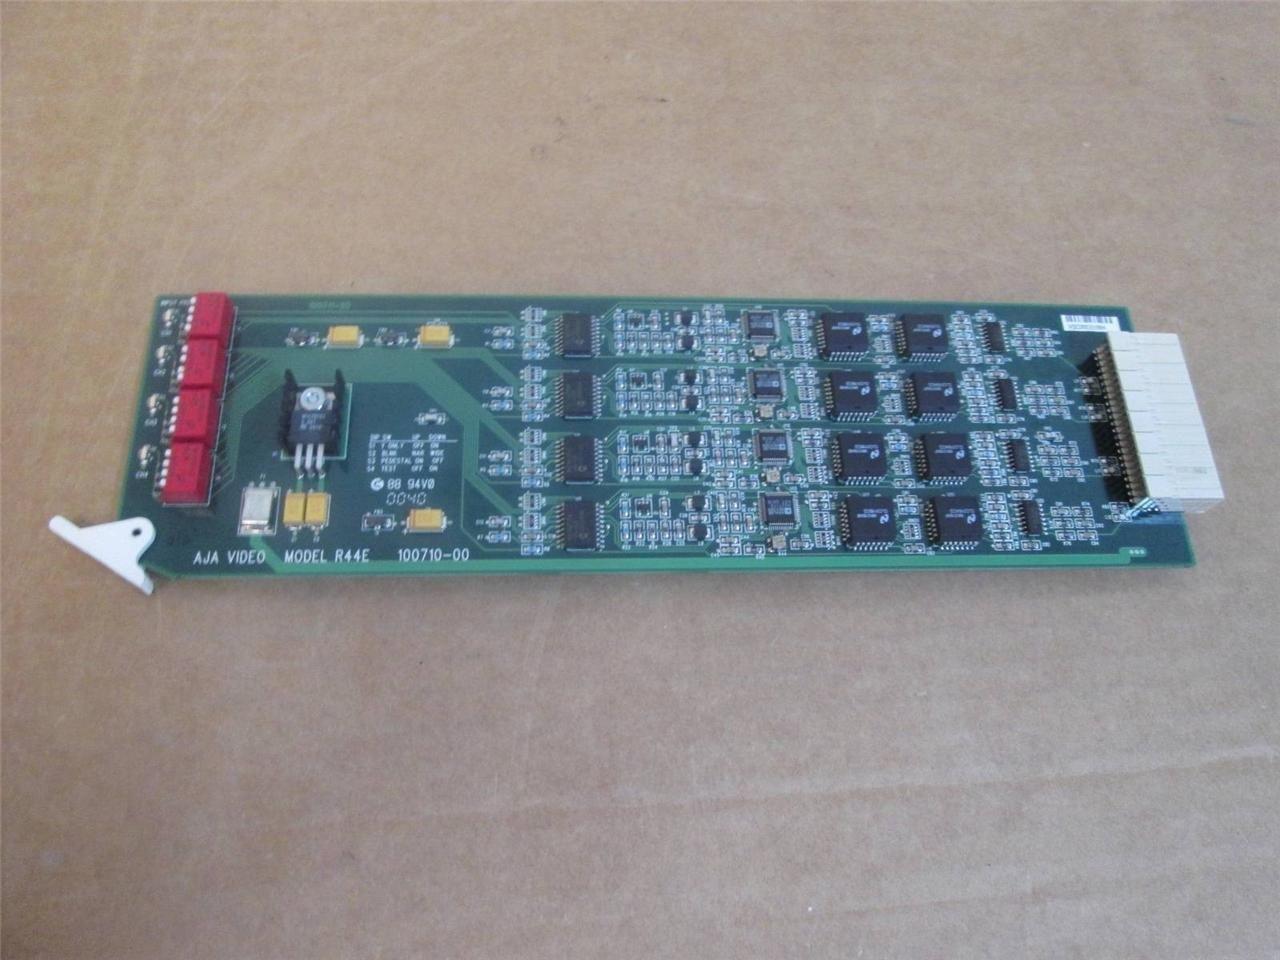 AJA R44E 4-Channel D/A Converter (SDI to NTSC/PAL) (R44E)